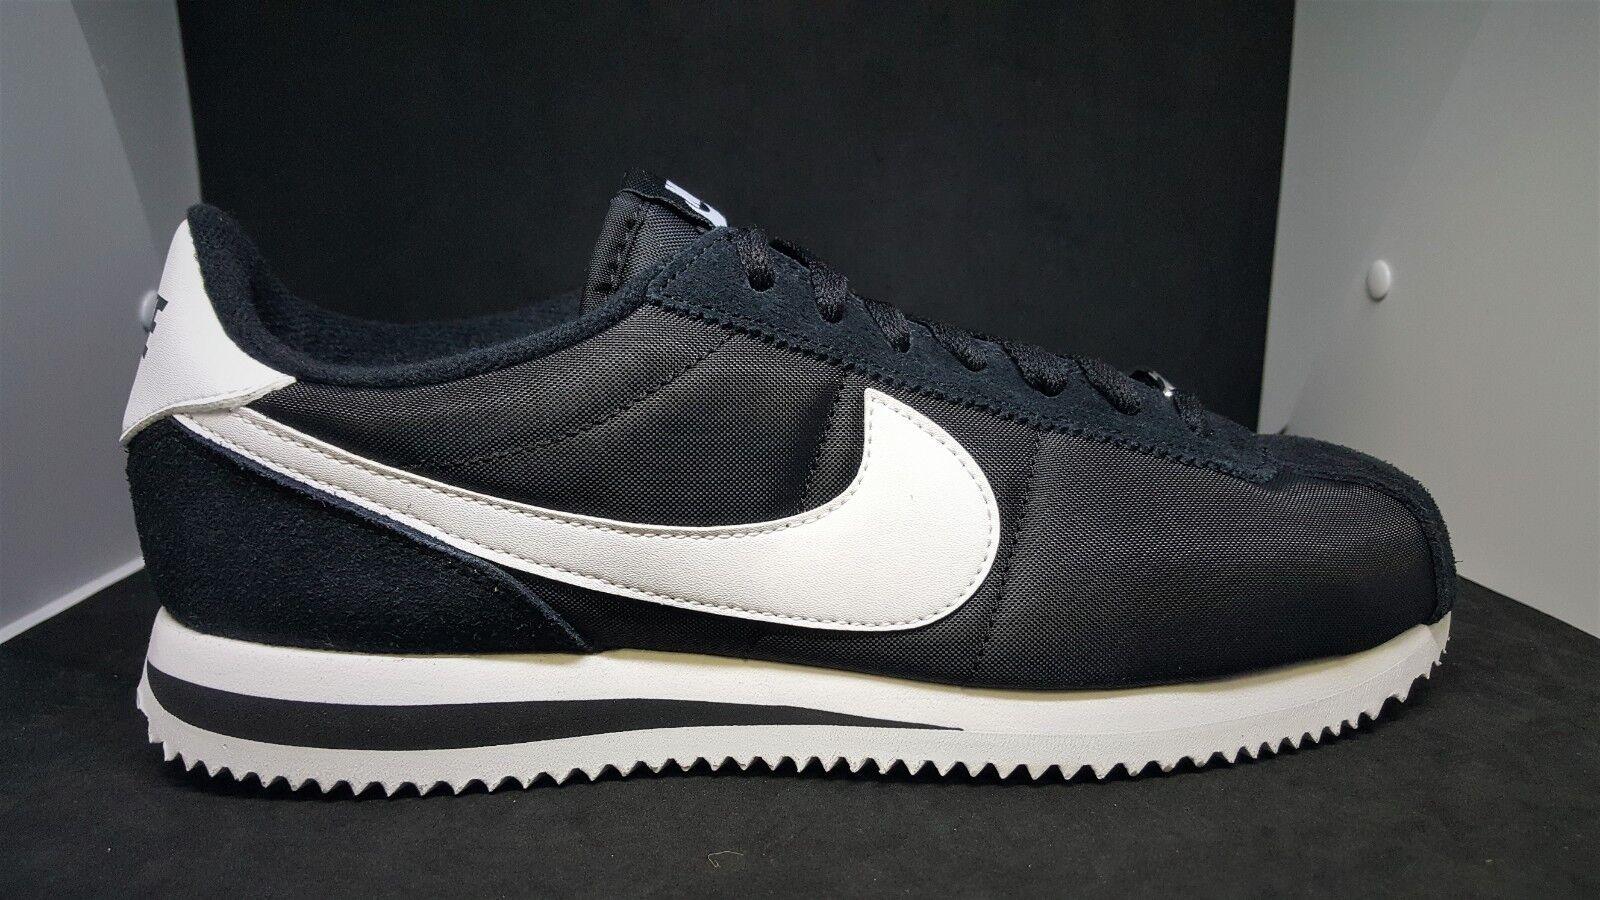 separation shoes f2e03 615fc Nike Classic Cortez Nylon Black White Men Men Men shoes Lifestyle Sneakers  819720-011 f1edbb